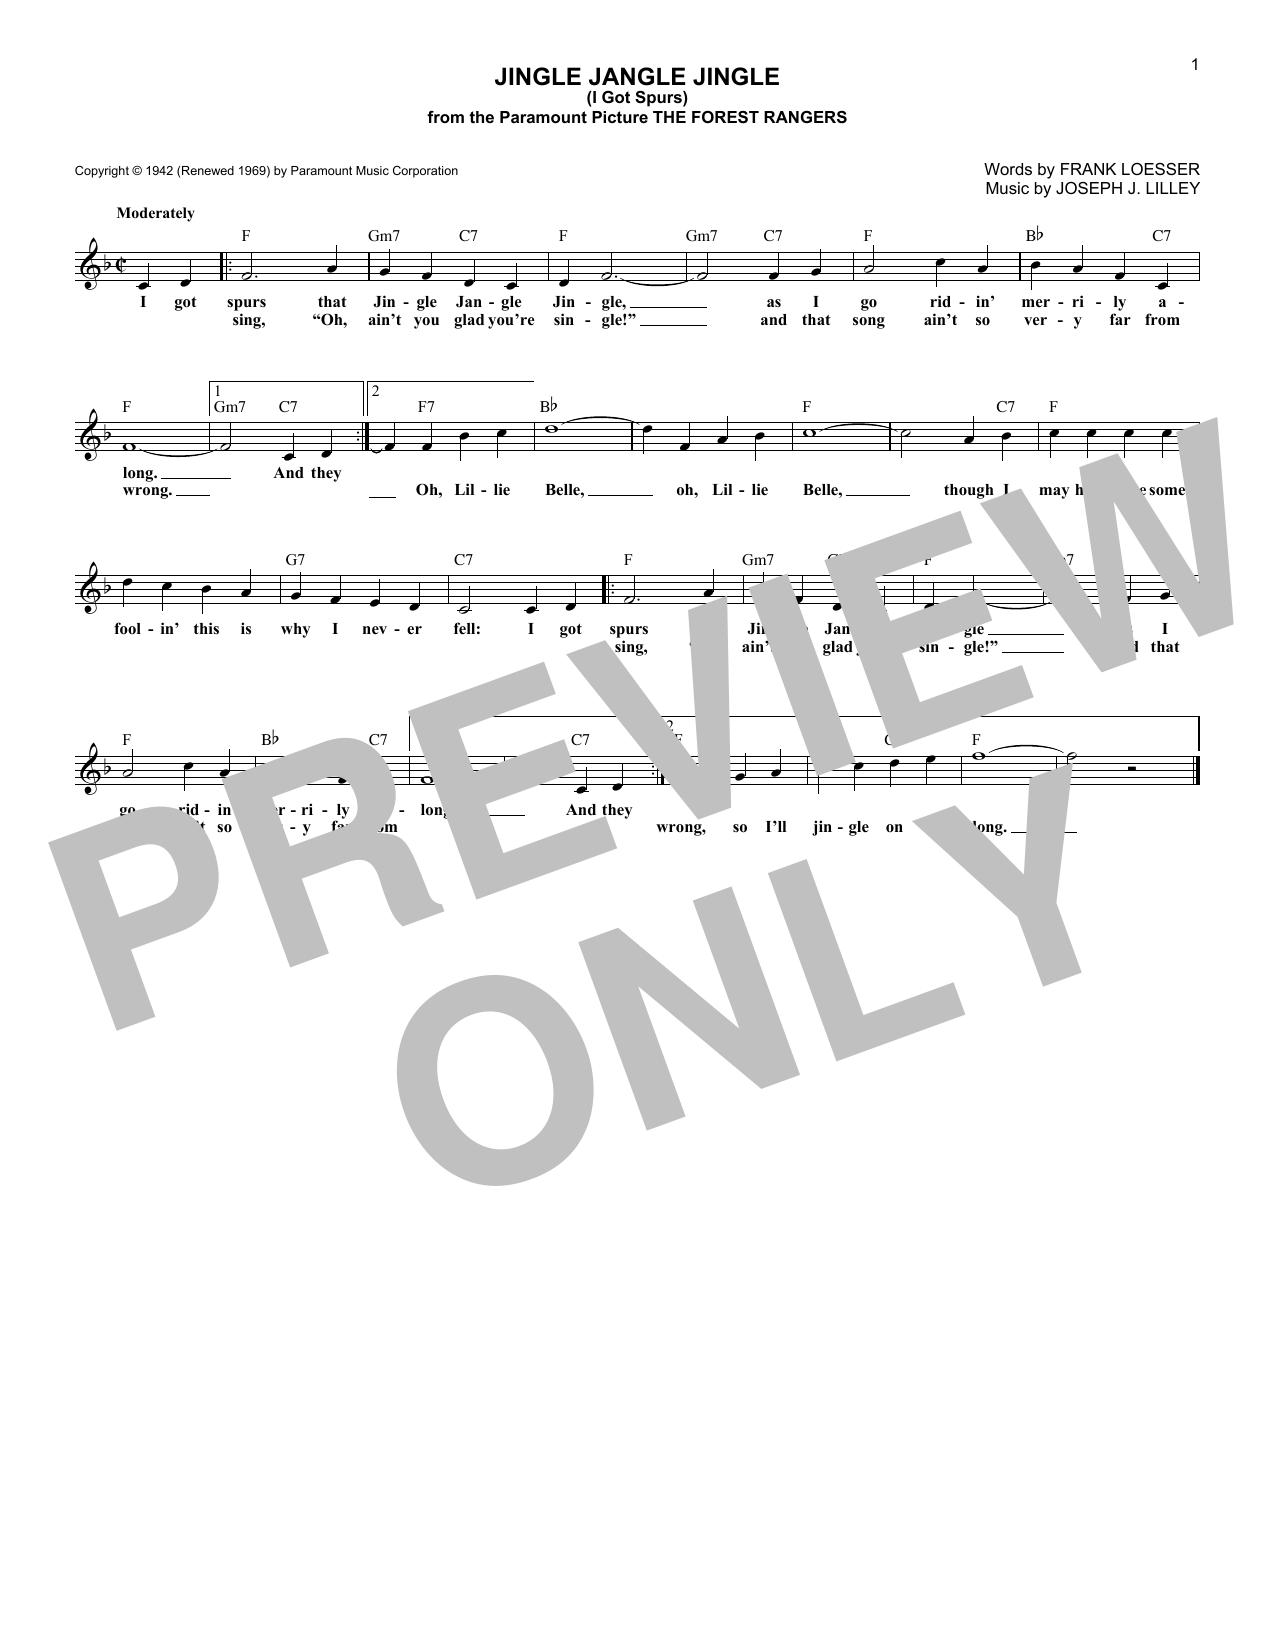 Jingle Jangle Jingle (I Got Spurs) Sheet Music